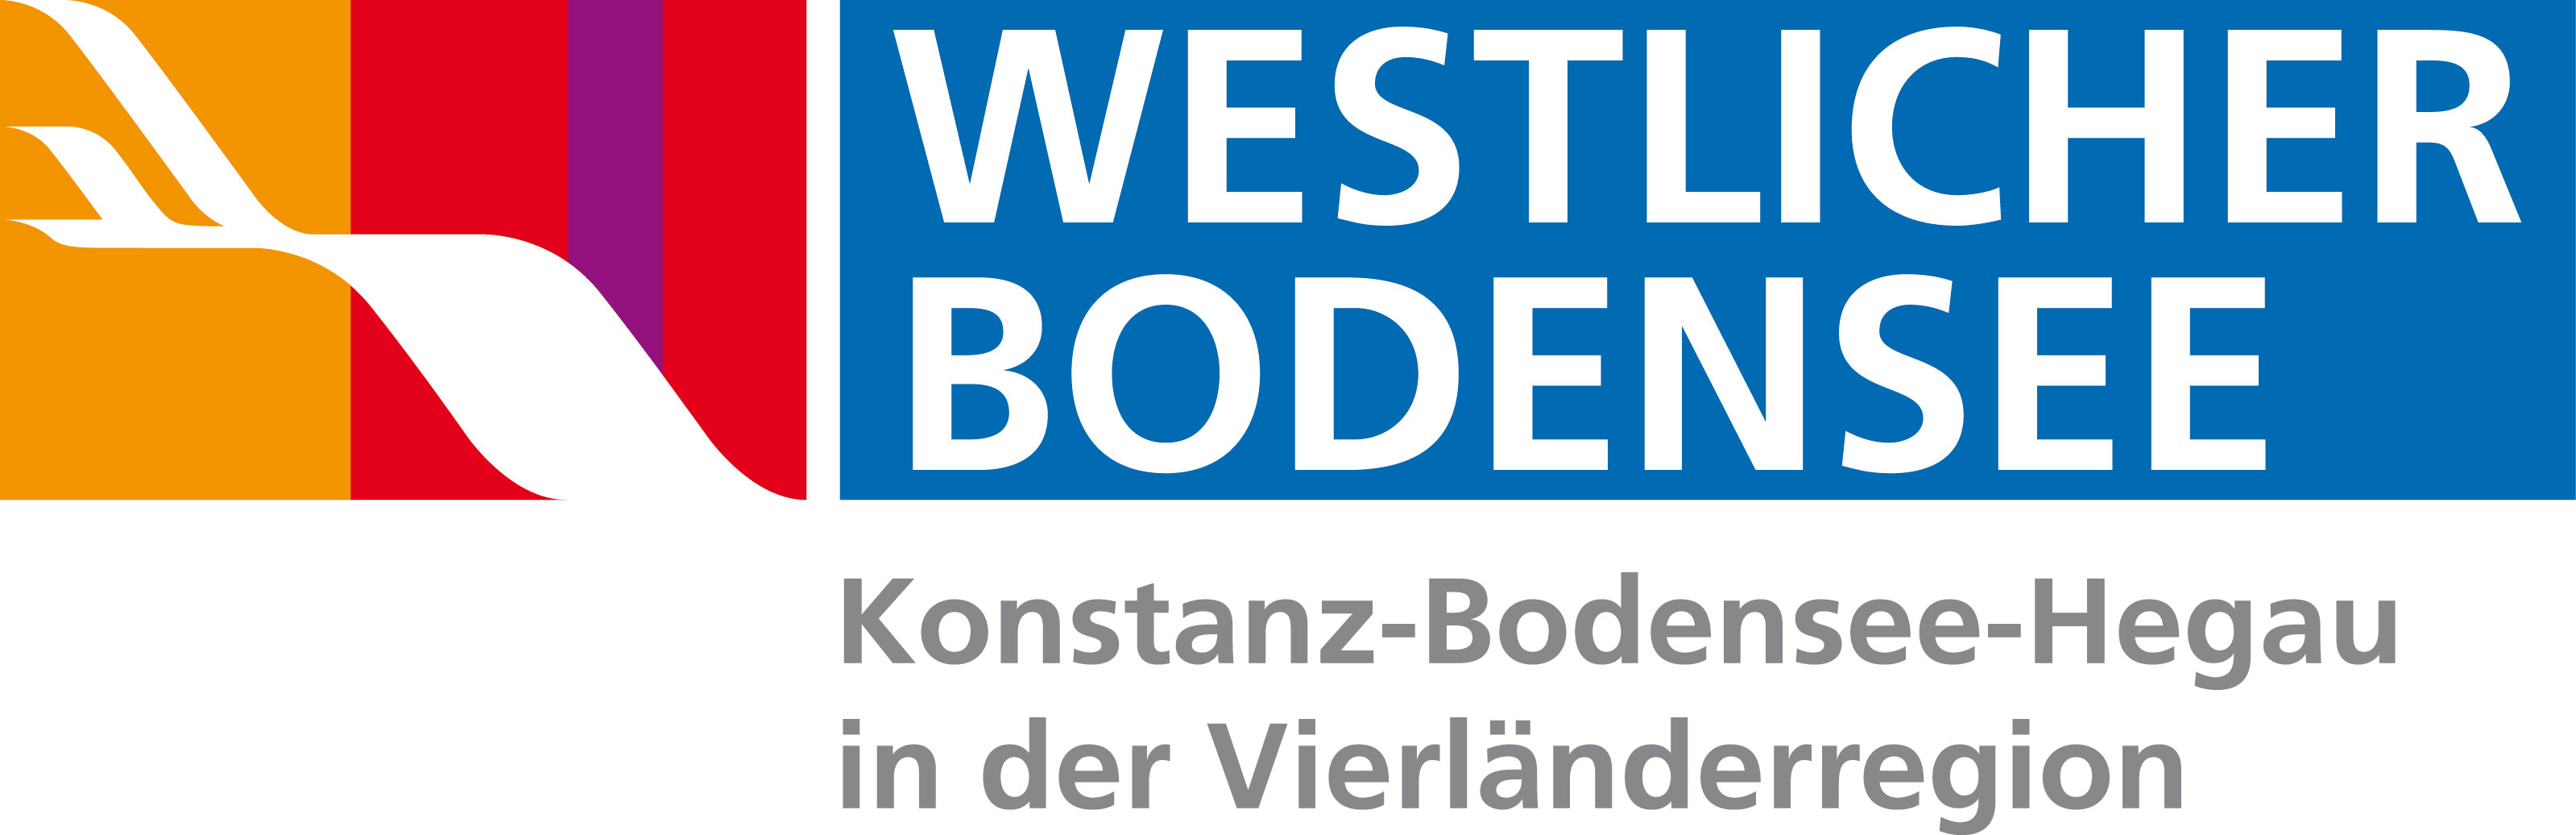 Logo Hegau Tourismus - Vulkane, Burgen, Bodensee